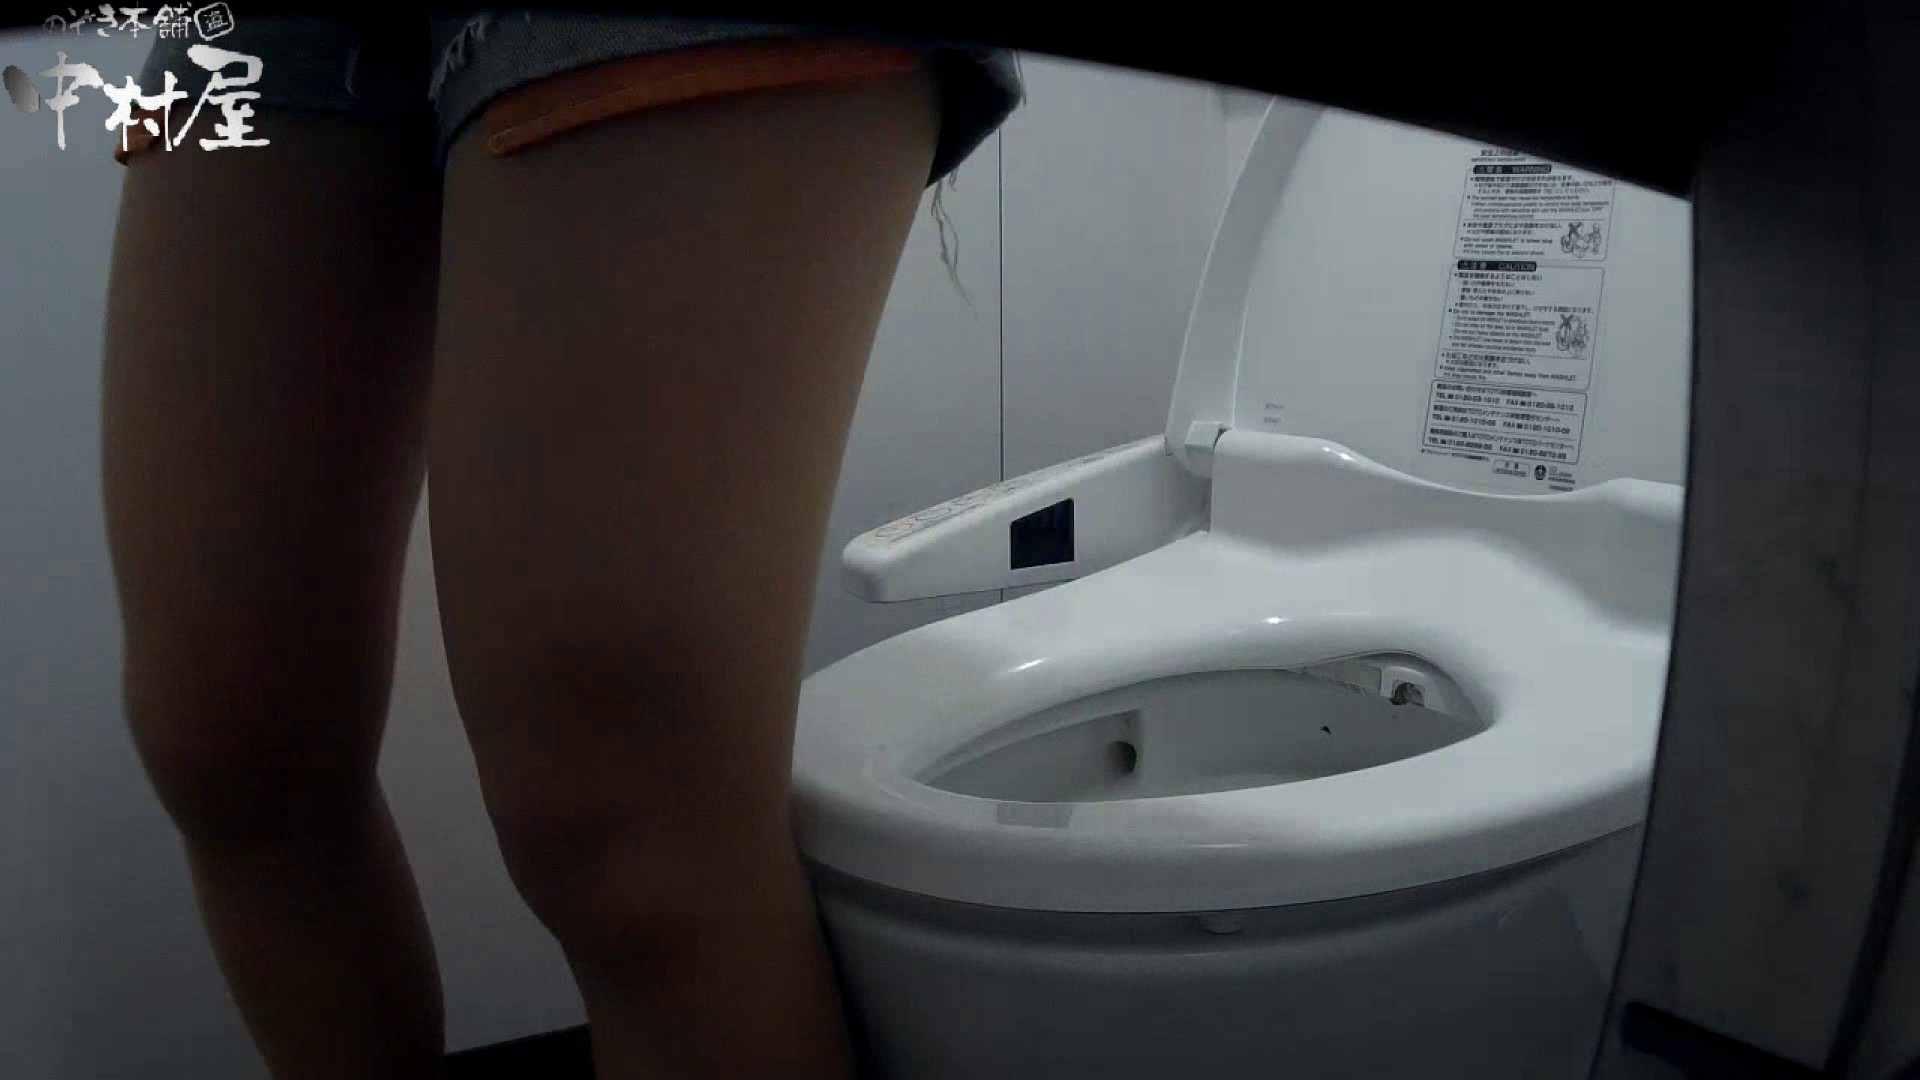 【某有名大学女性洗面所】有名大学女性洗面所 vol.35 安定の2カメ 最近の女性は保守的な下着が多め? 下着   潜入画像  83画像 49